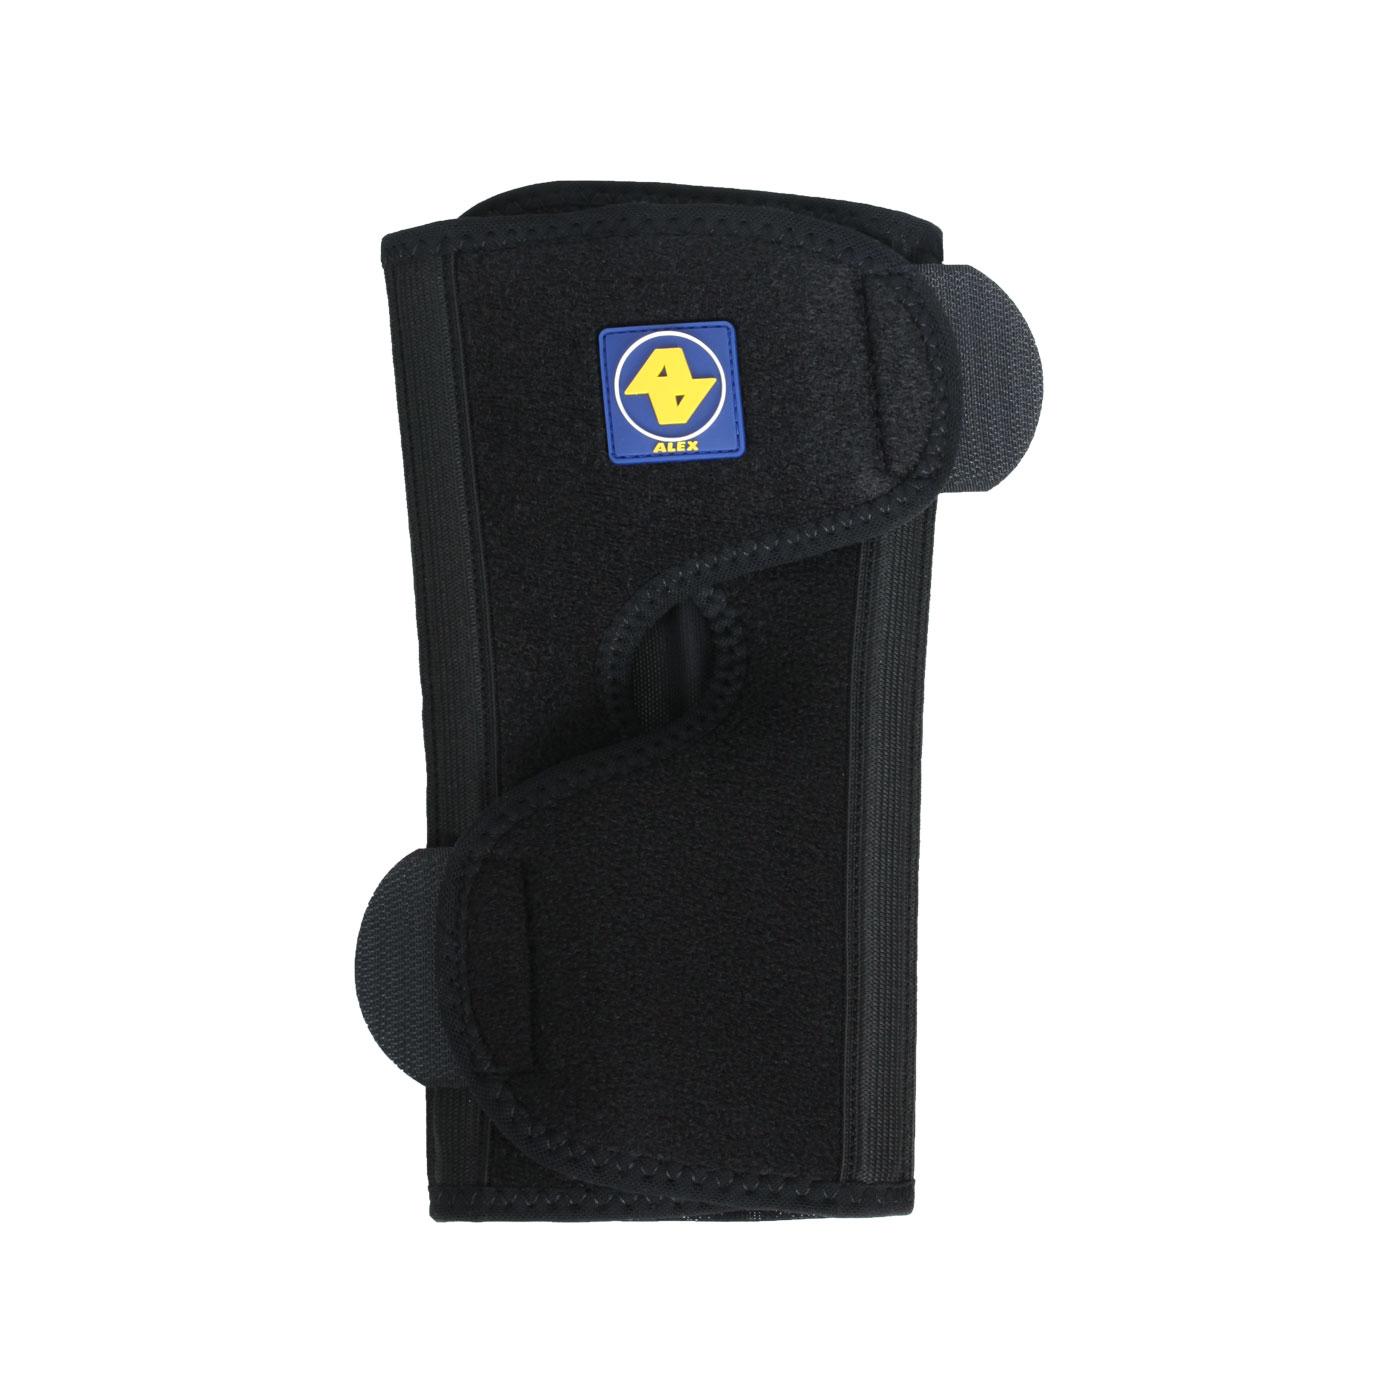 ALEX  高透氣網狀護膝T-35 - 依賣場